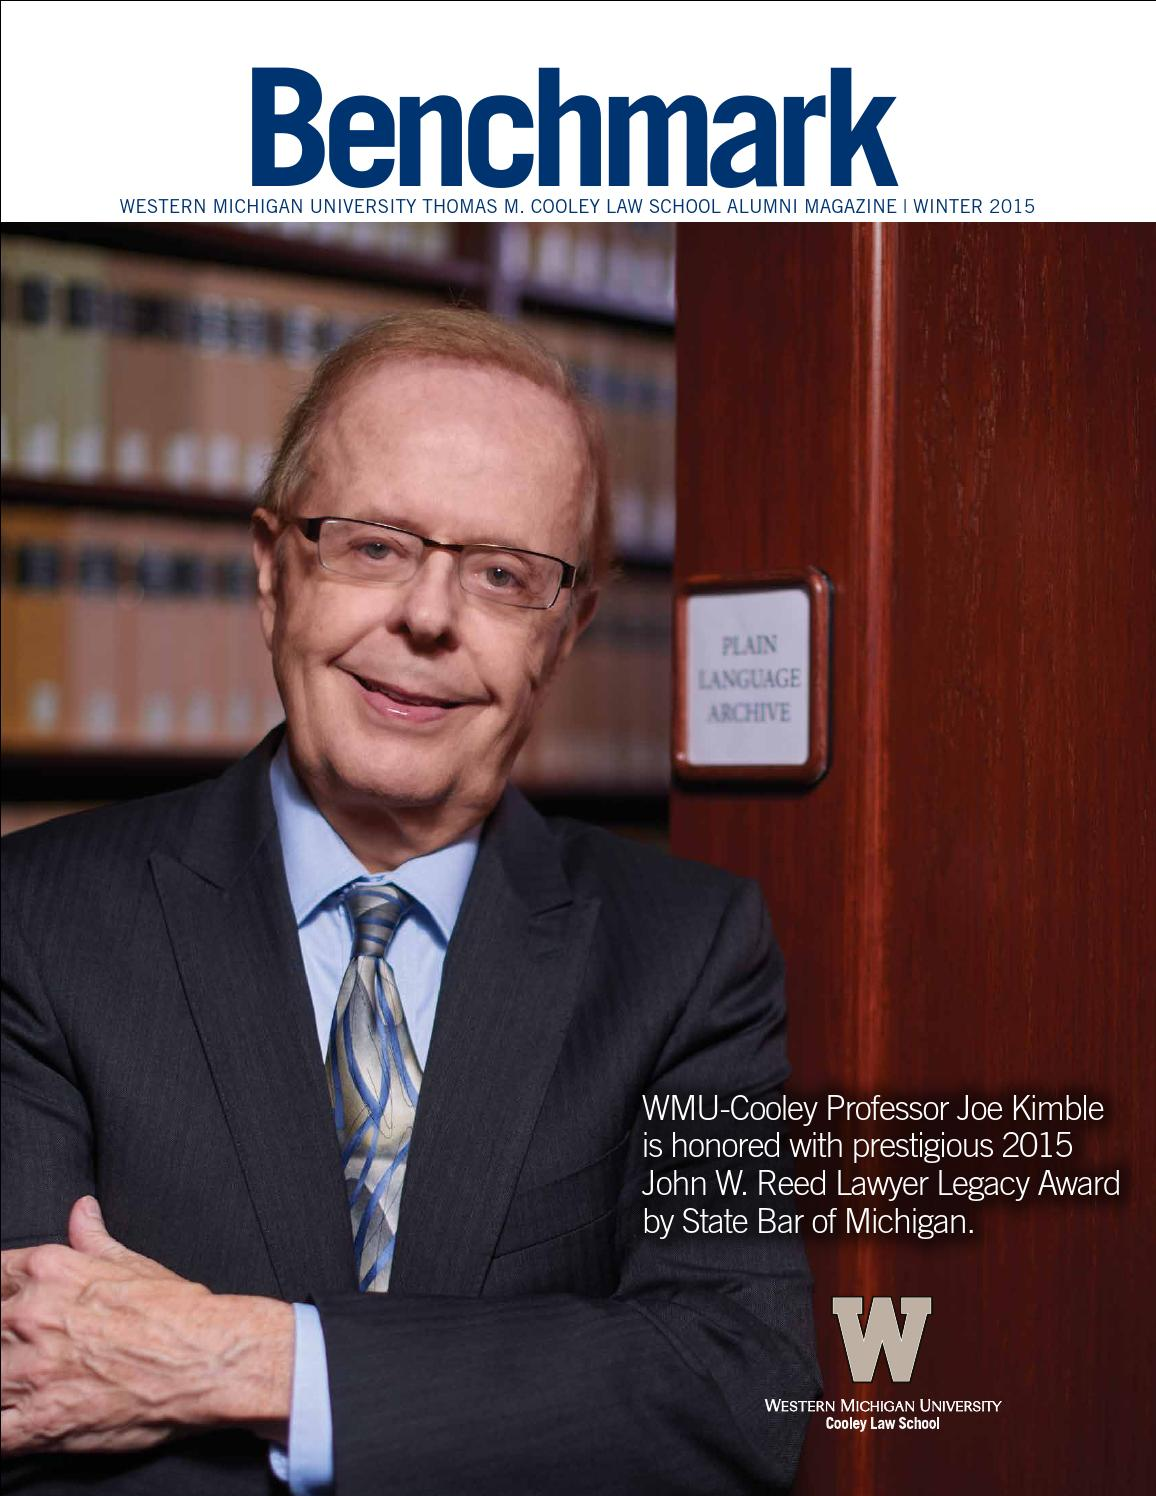 baltimore law fall by university of baltimore school of law wmu benchmark alumni magazine winter 2015